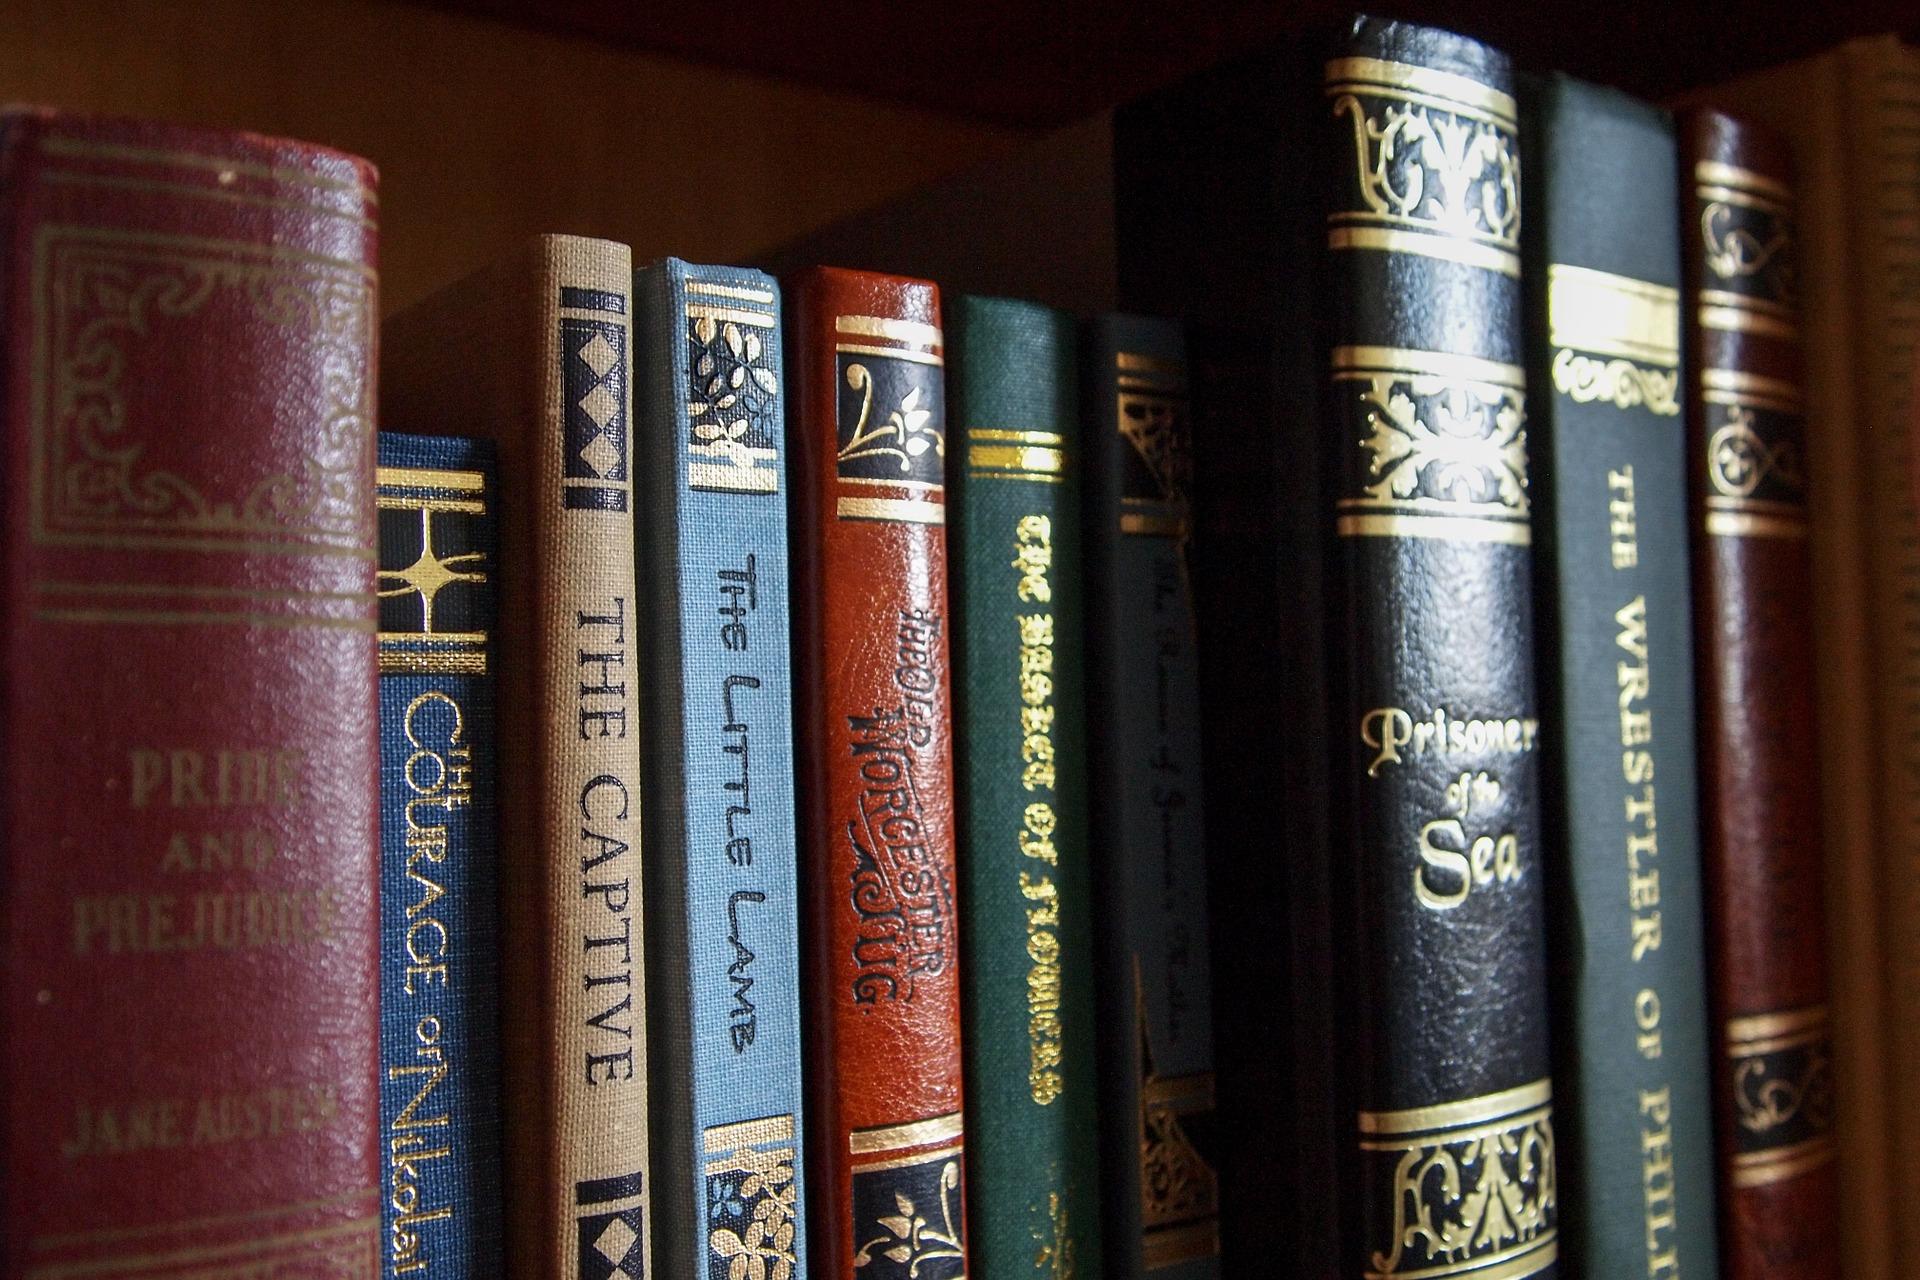 books-1141910_1920